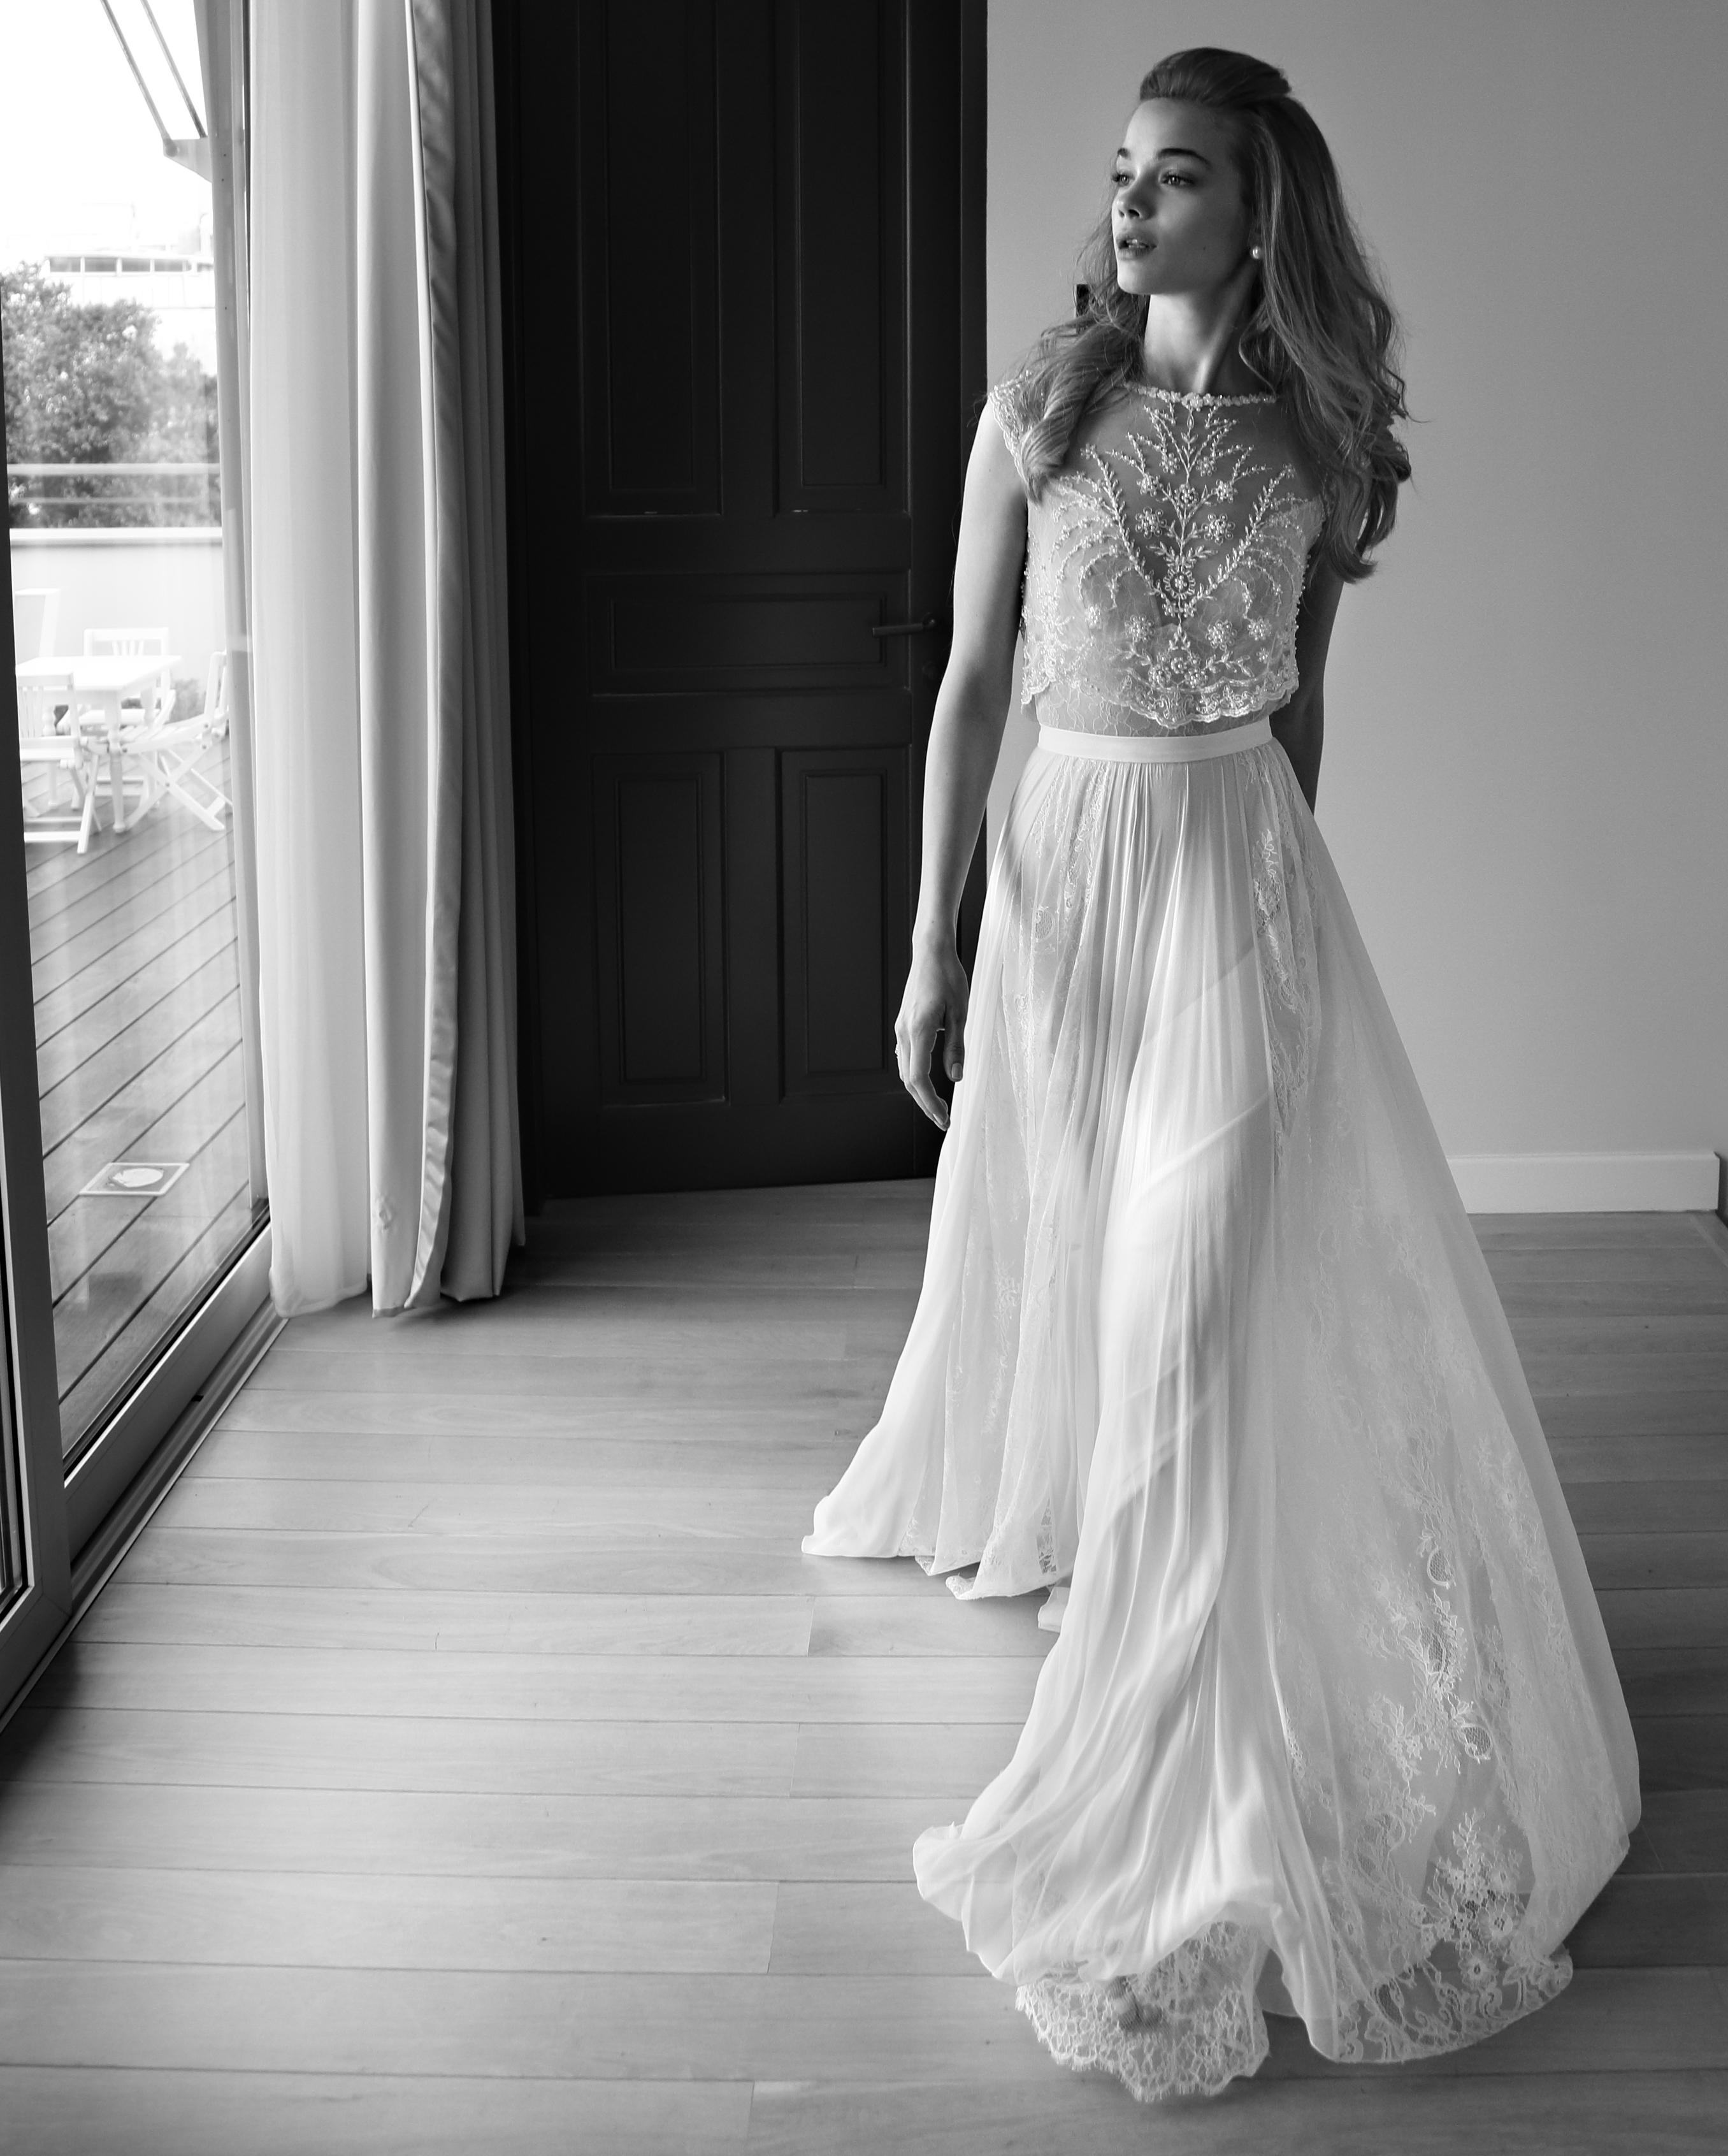 50-states-wedding-dresses-minnesota-lihi-hod-0615.jpg